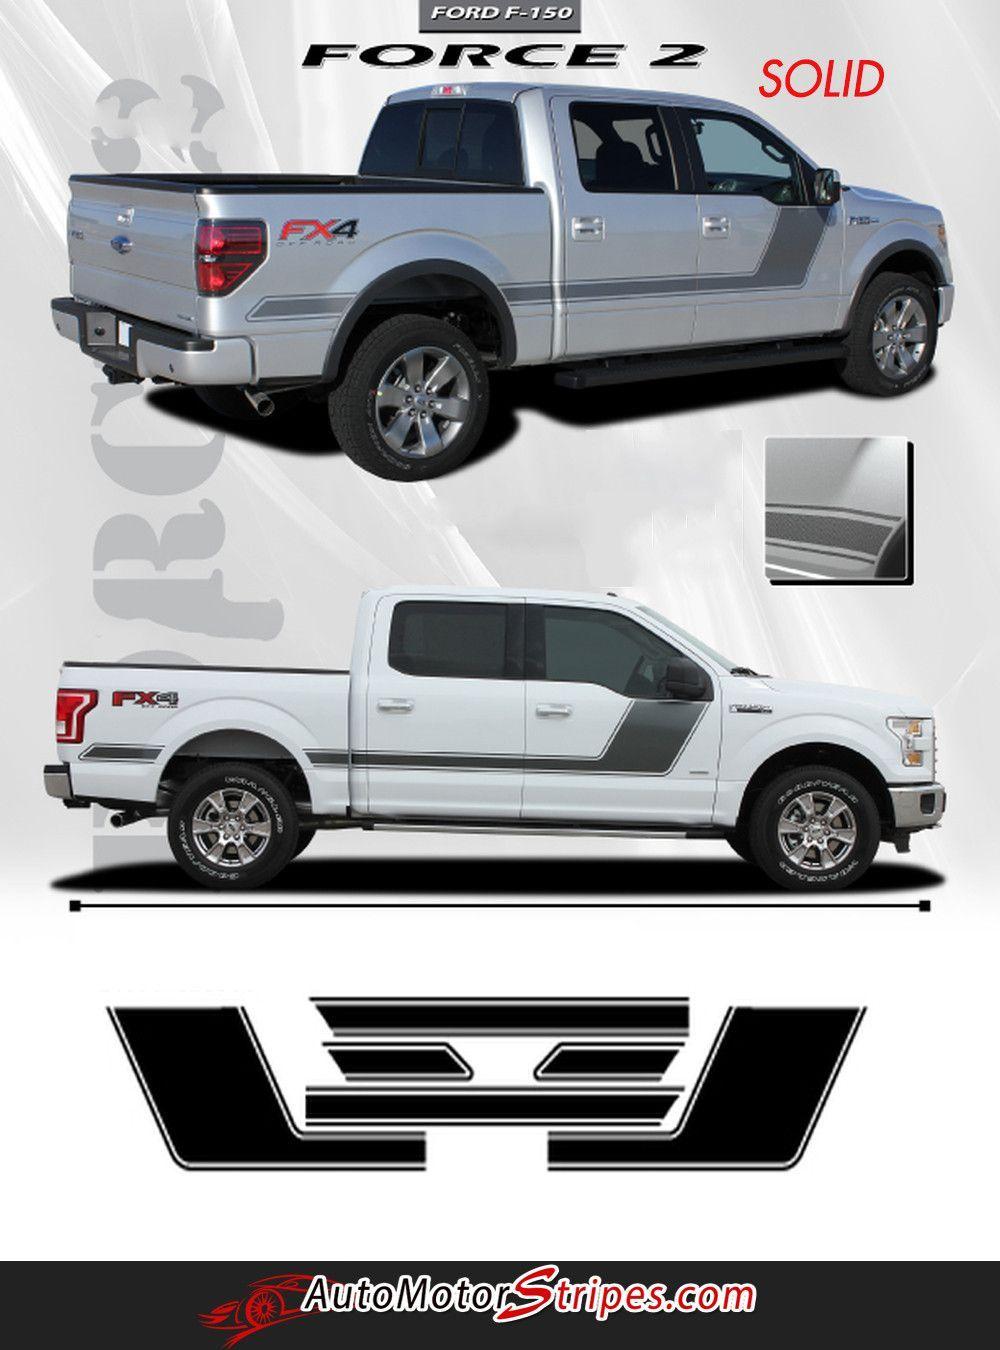 2008-2013 2014 Ford F-150 Hockey Side Stripes Graphics 03 F150